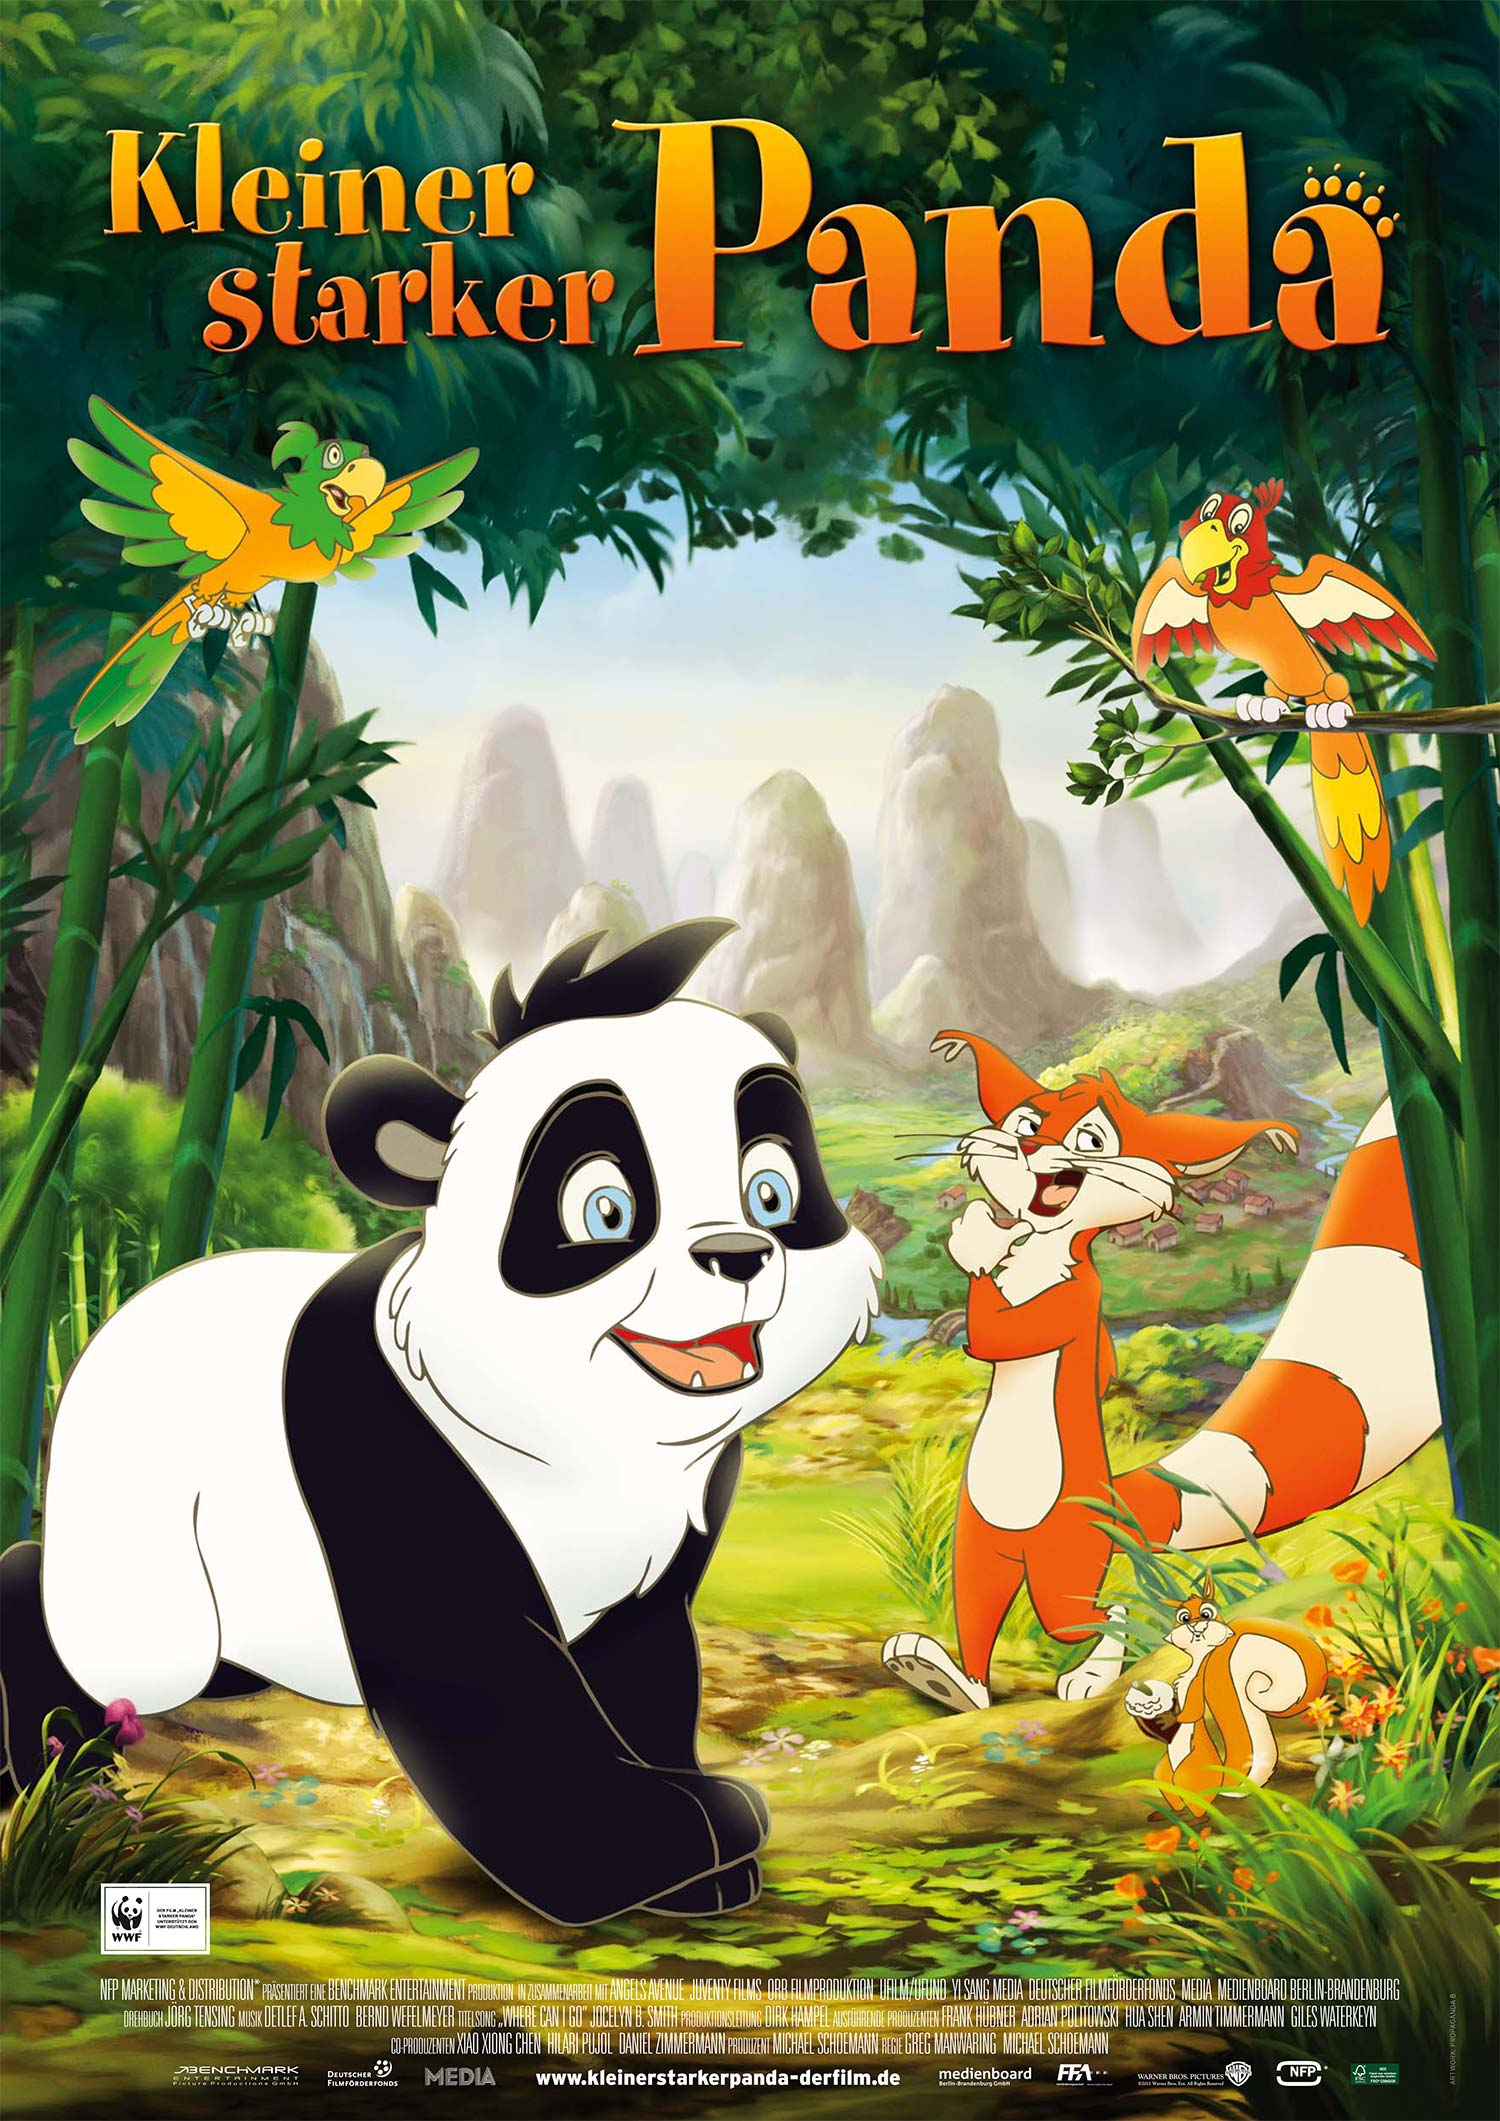 "NFP*<a href=""/kleiner-starker-panda"">→</a><strong>Kreation</strong>"